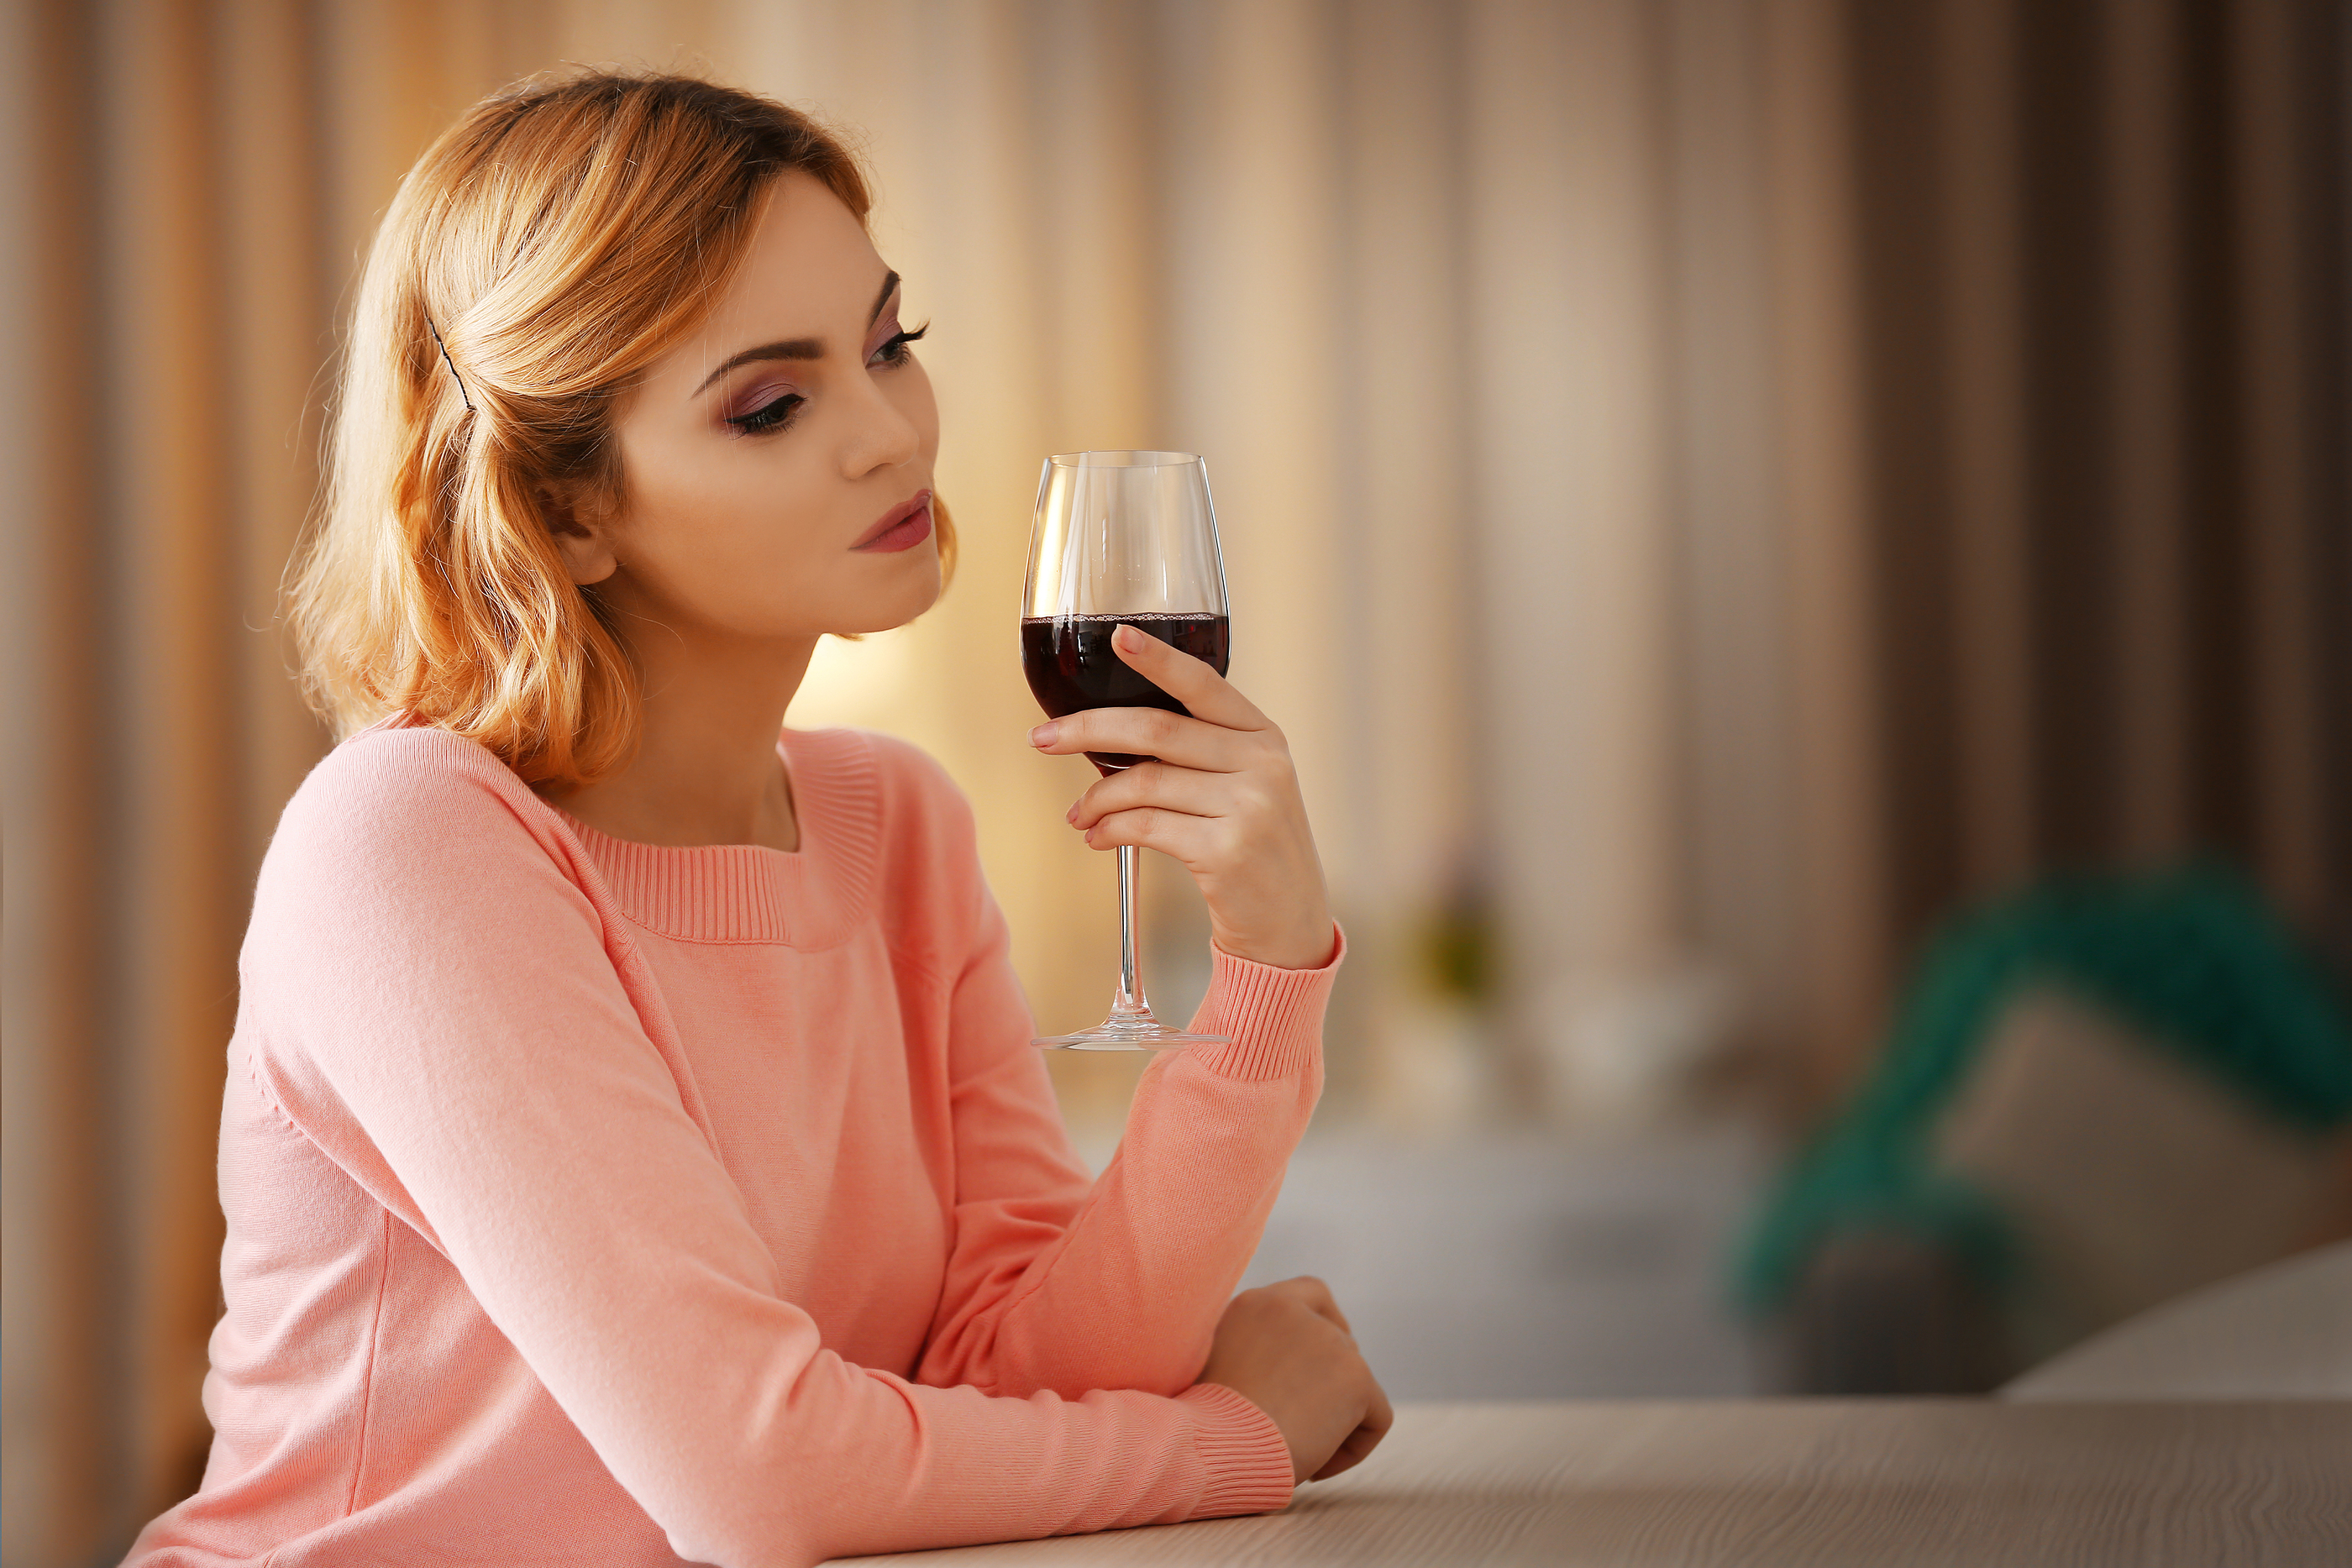 Glass Of Wine And Breastfeeding